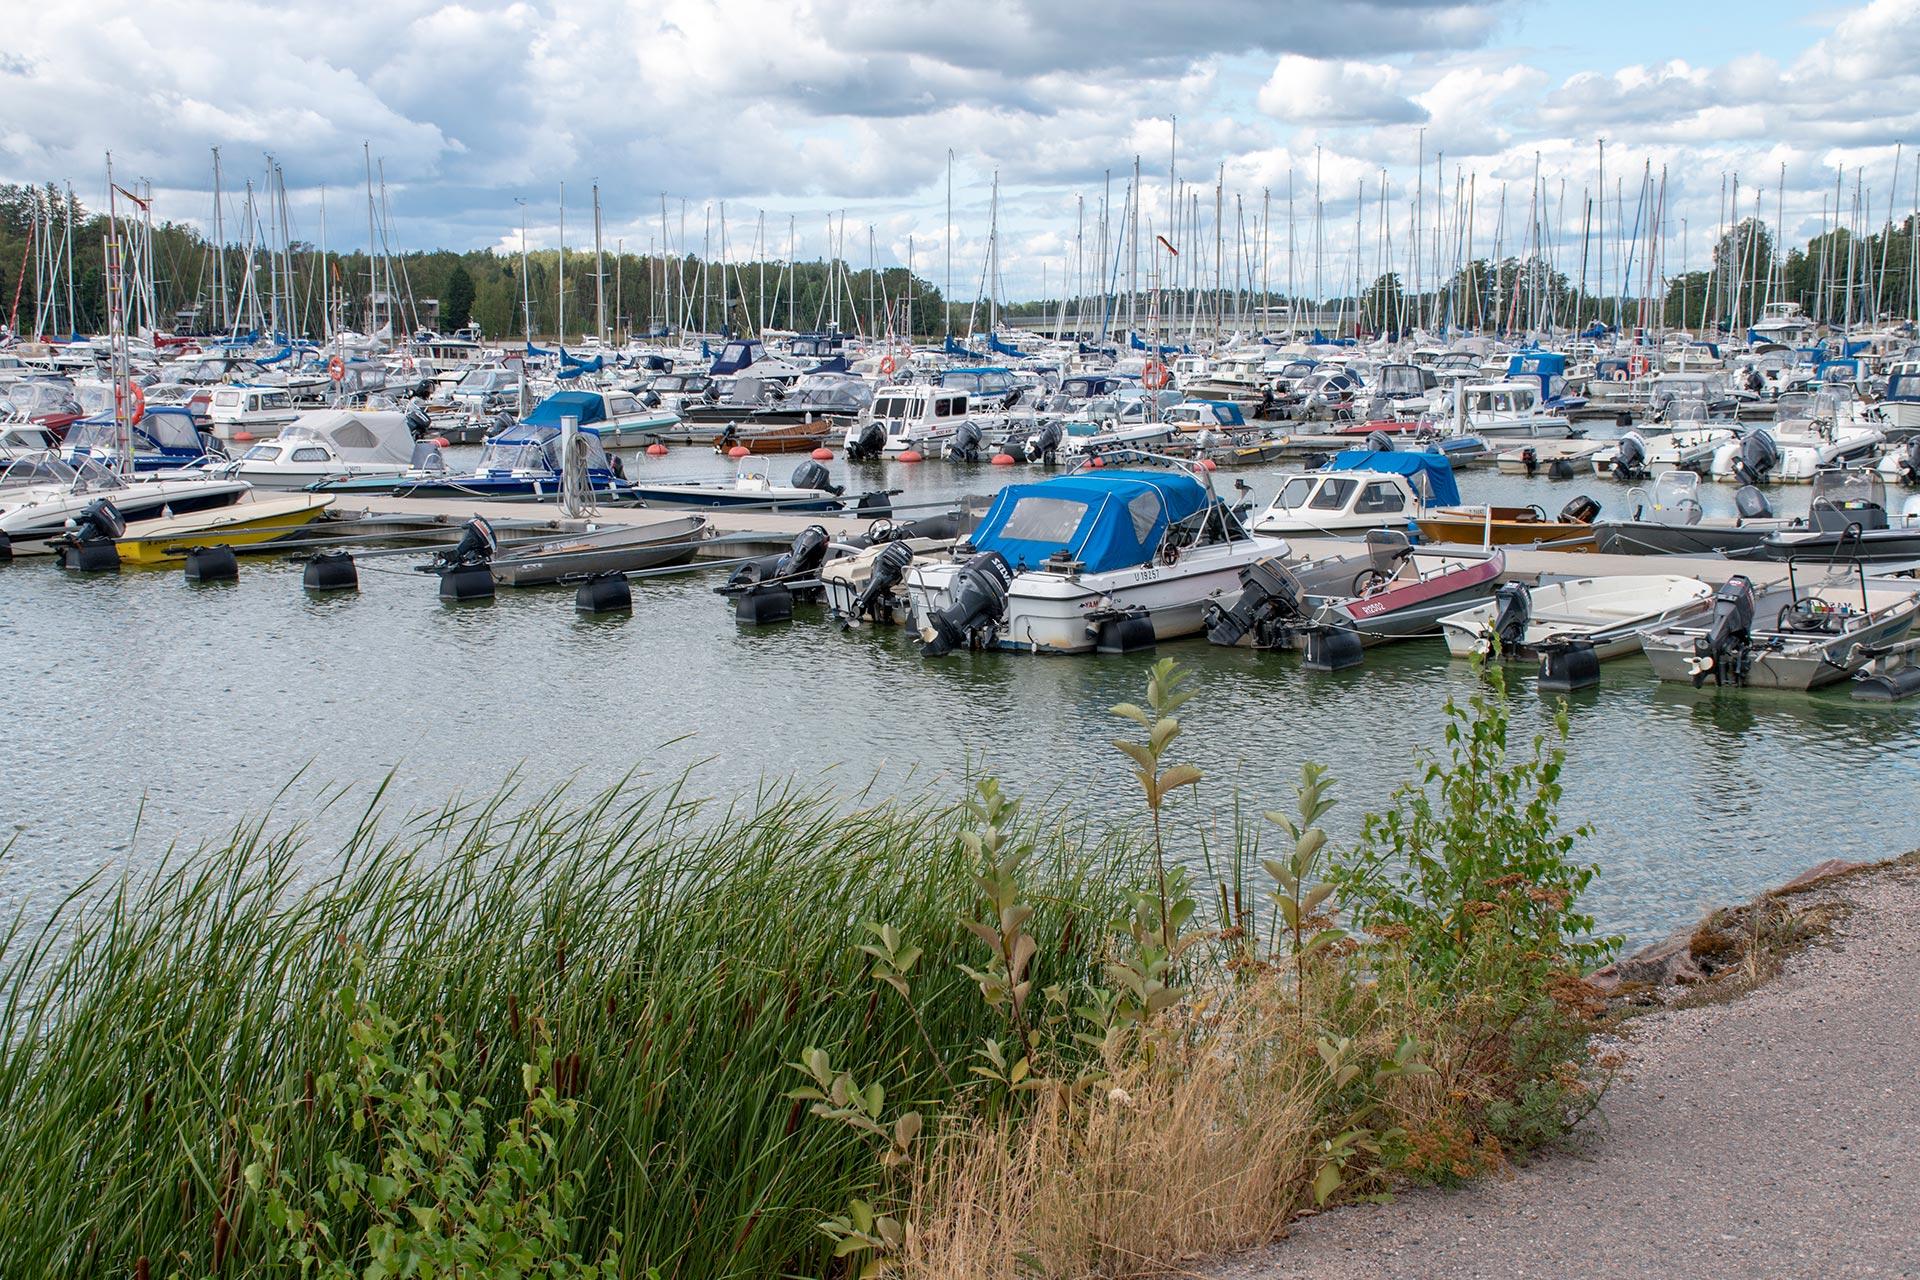 Kivenlahden venesatama © Visit Espoo